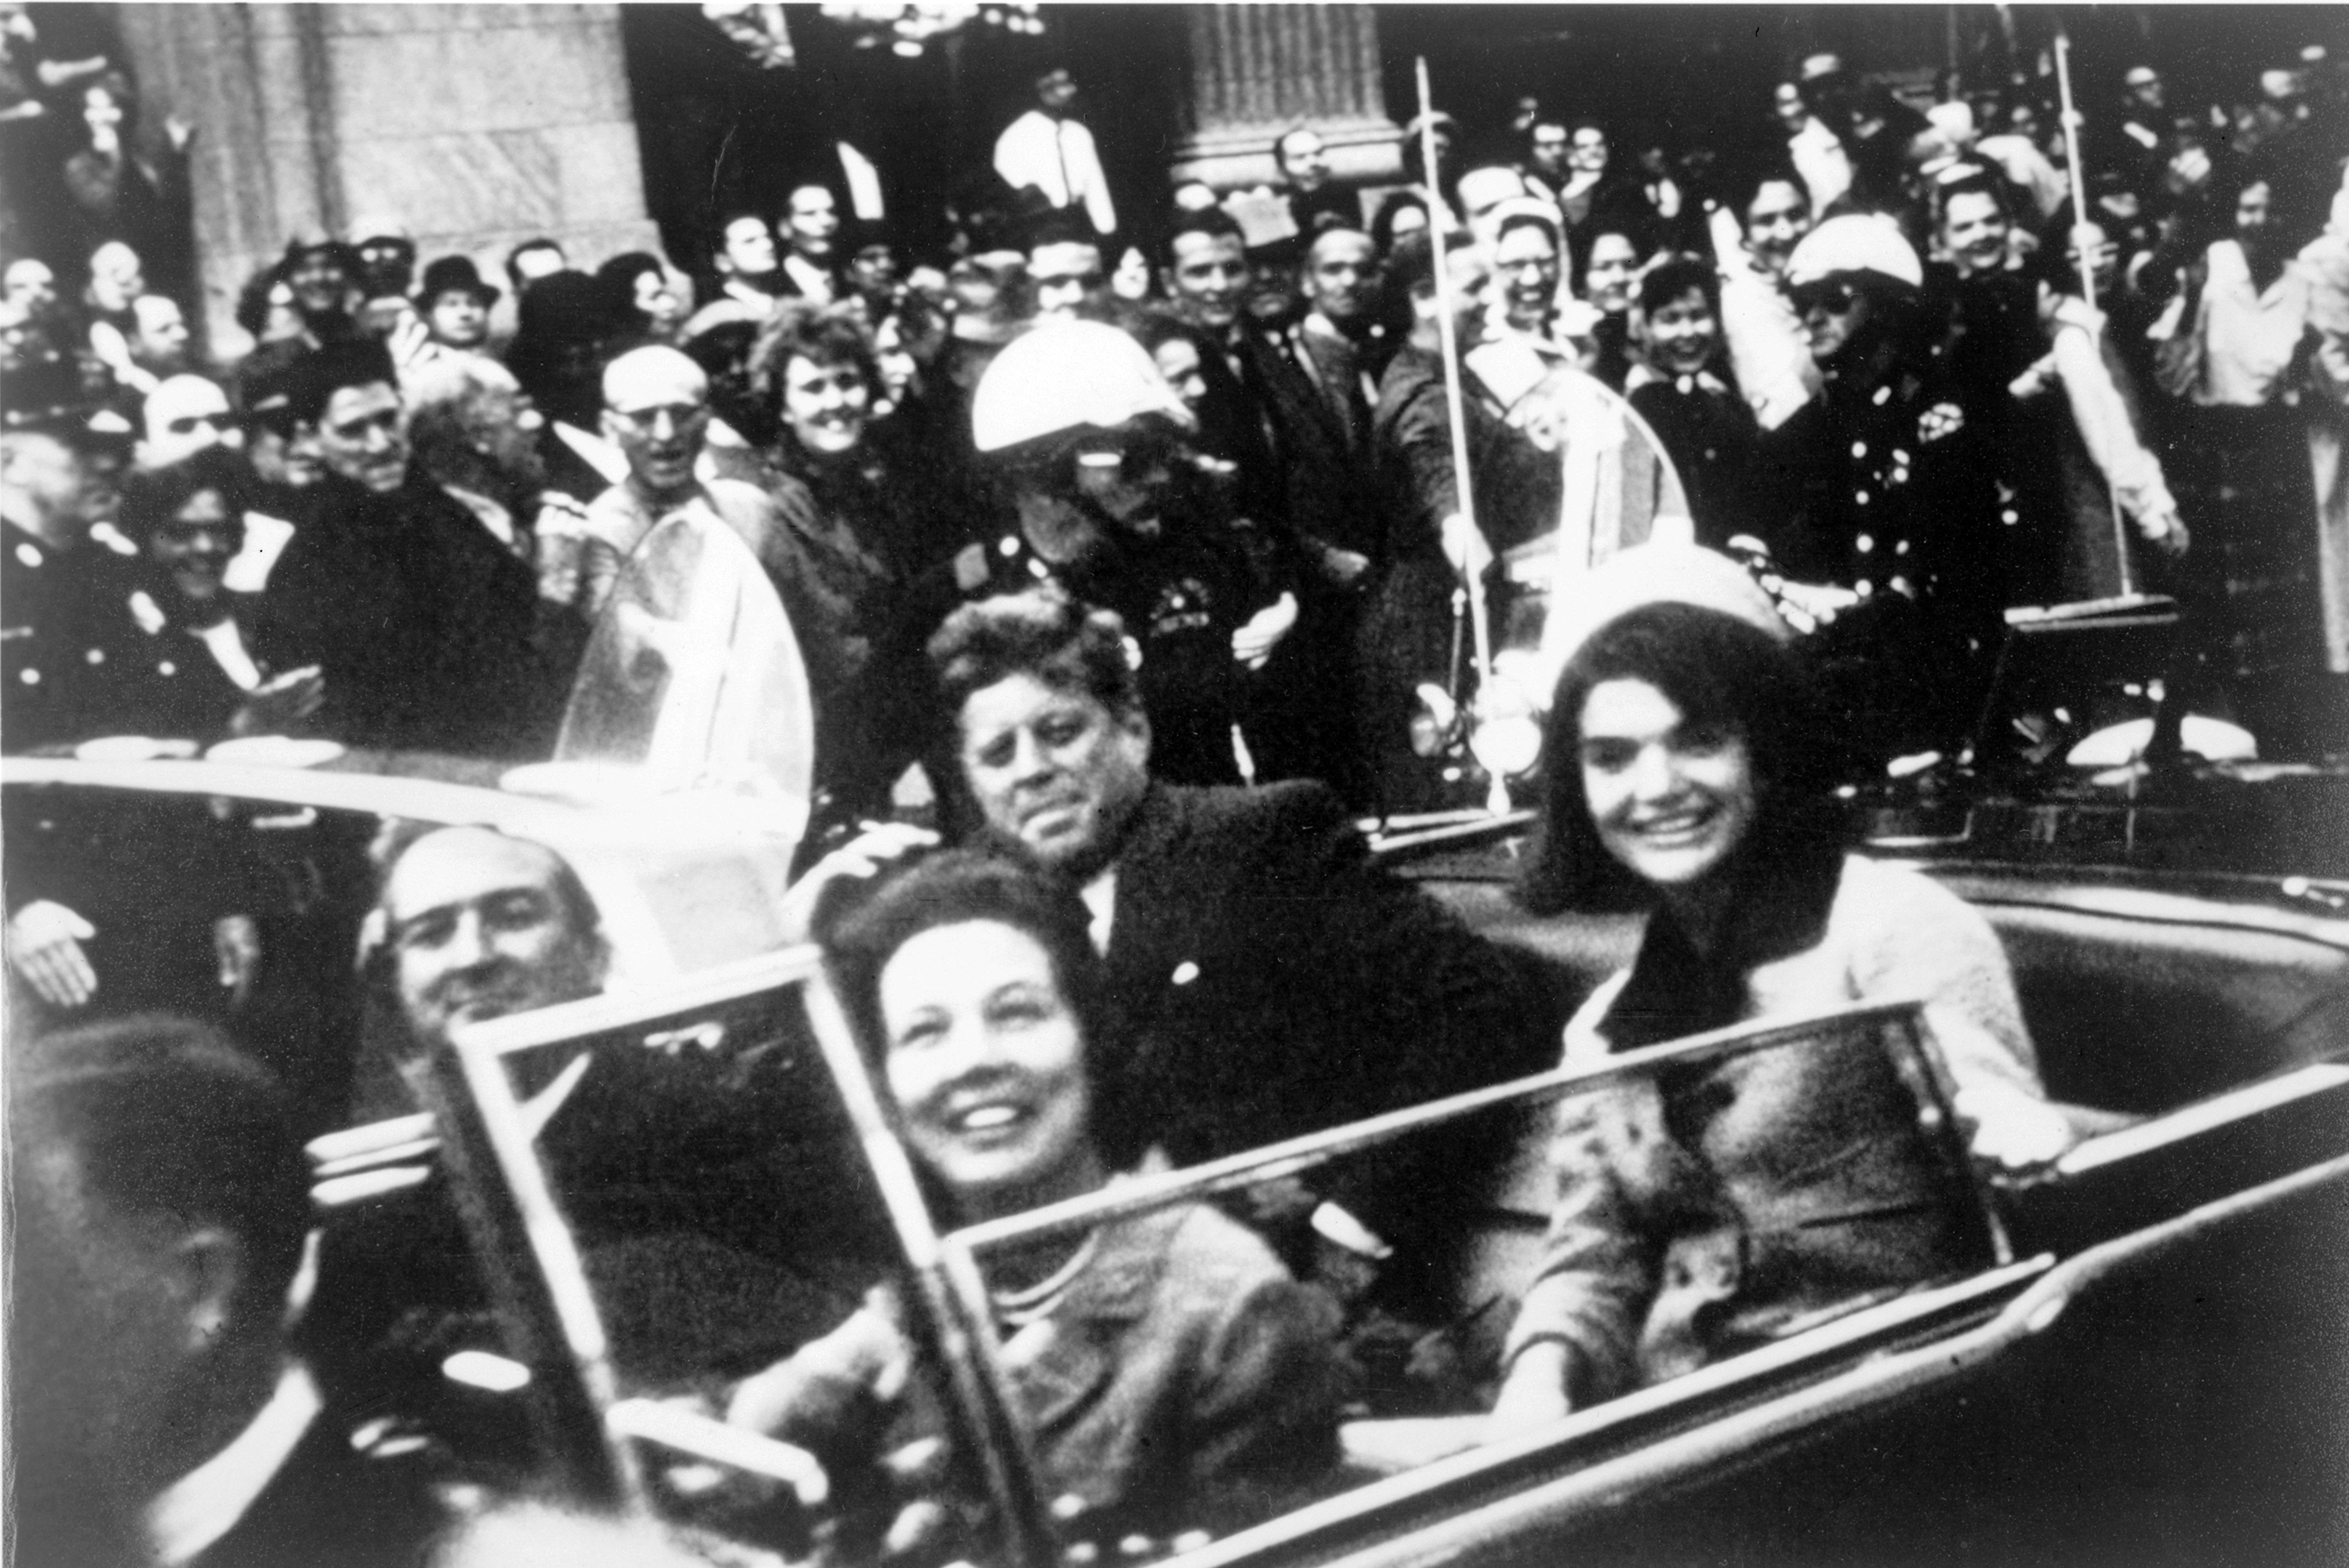 President John F Kennedy's motorcade in Dallas, Texas on Nov. 22, 1963.